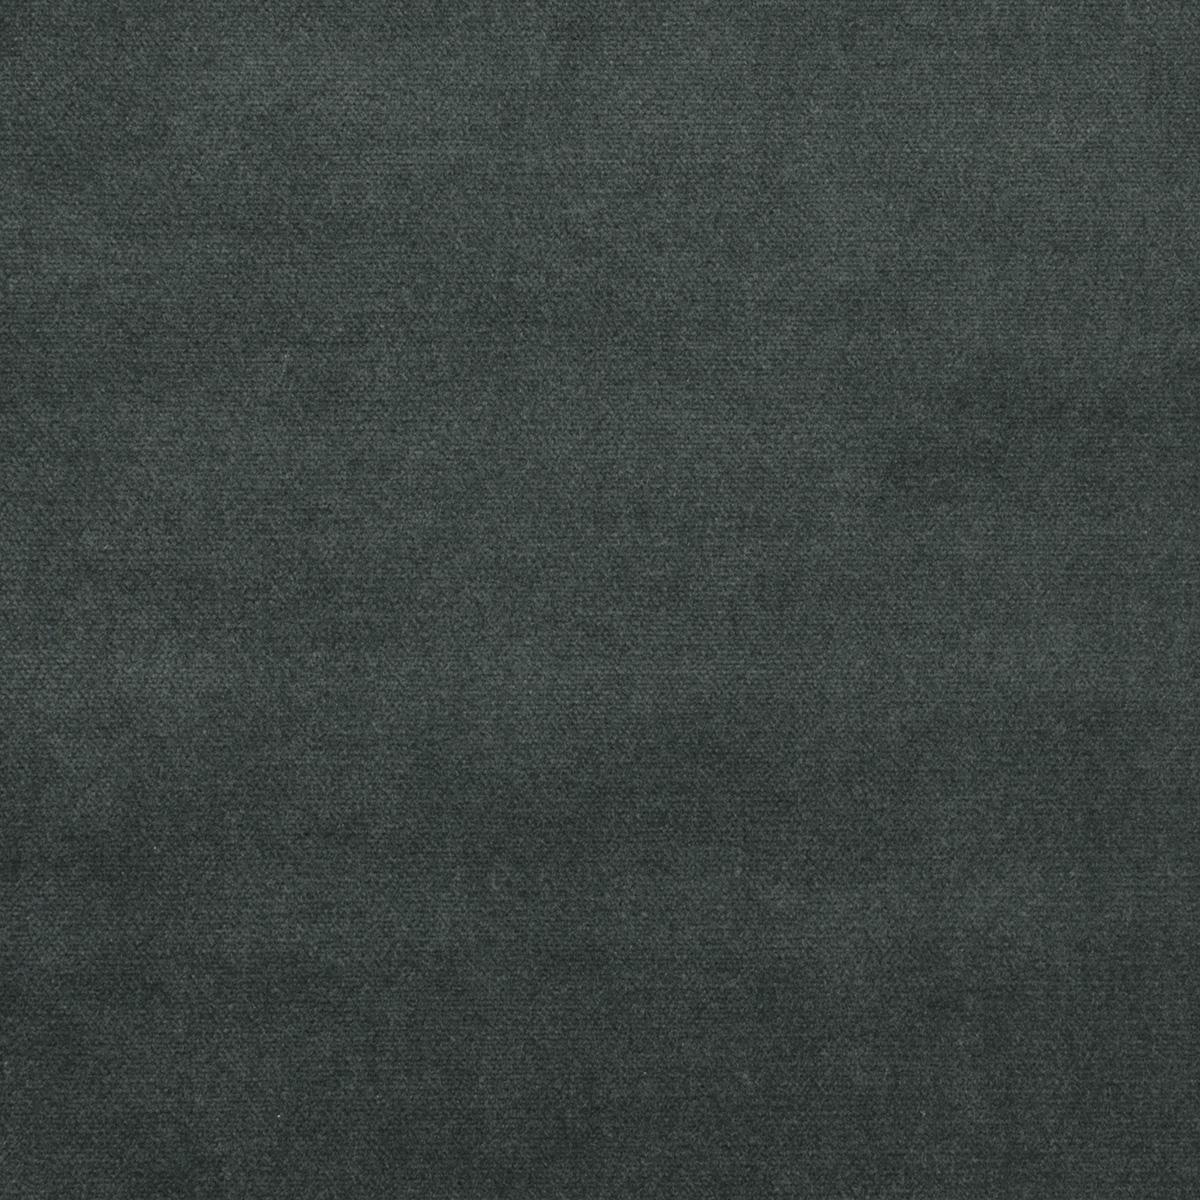 d680750152 Panache Velvet Slate | Fabric | Fabricut Contract